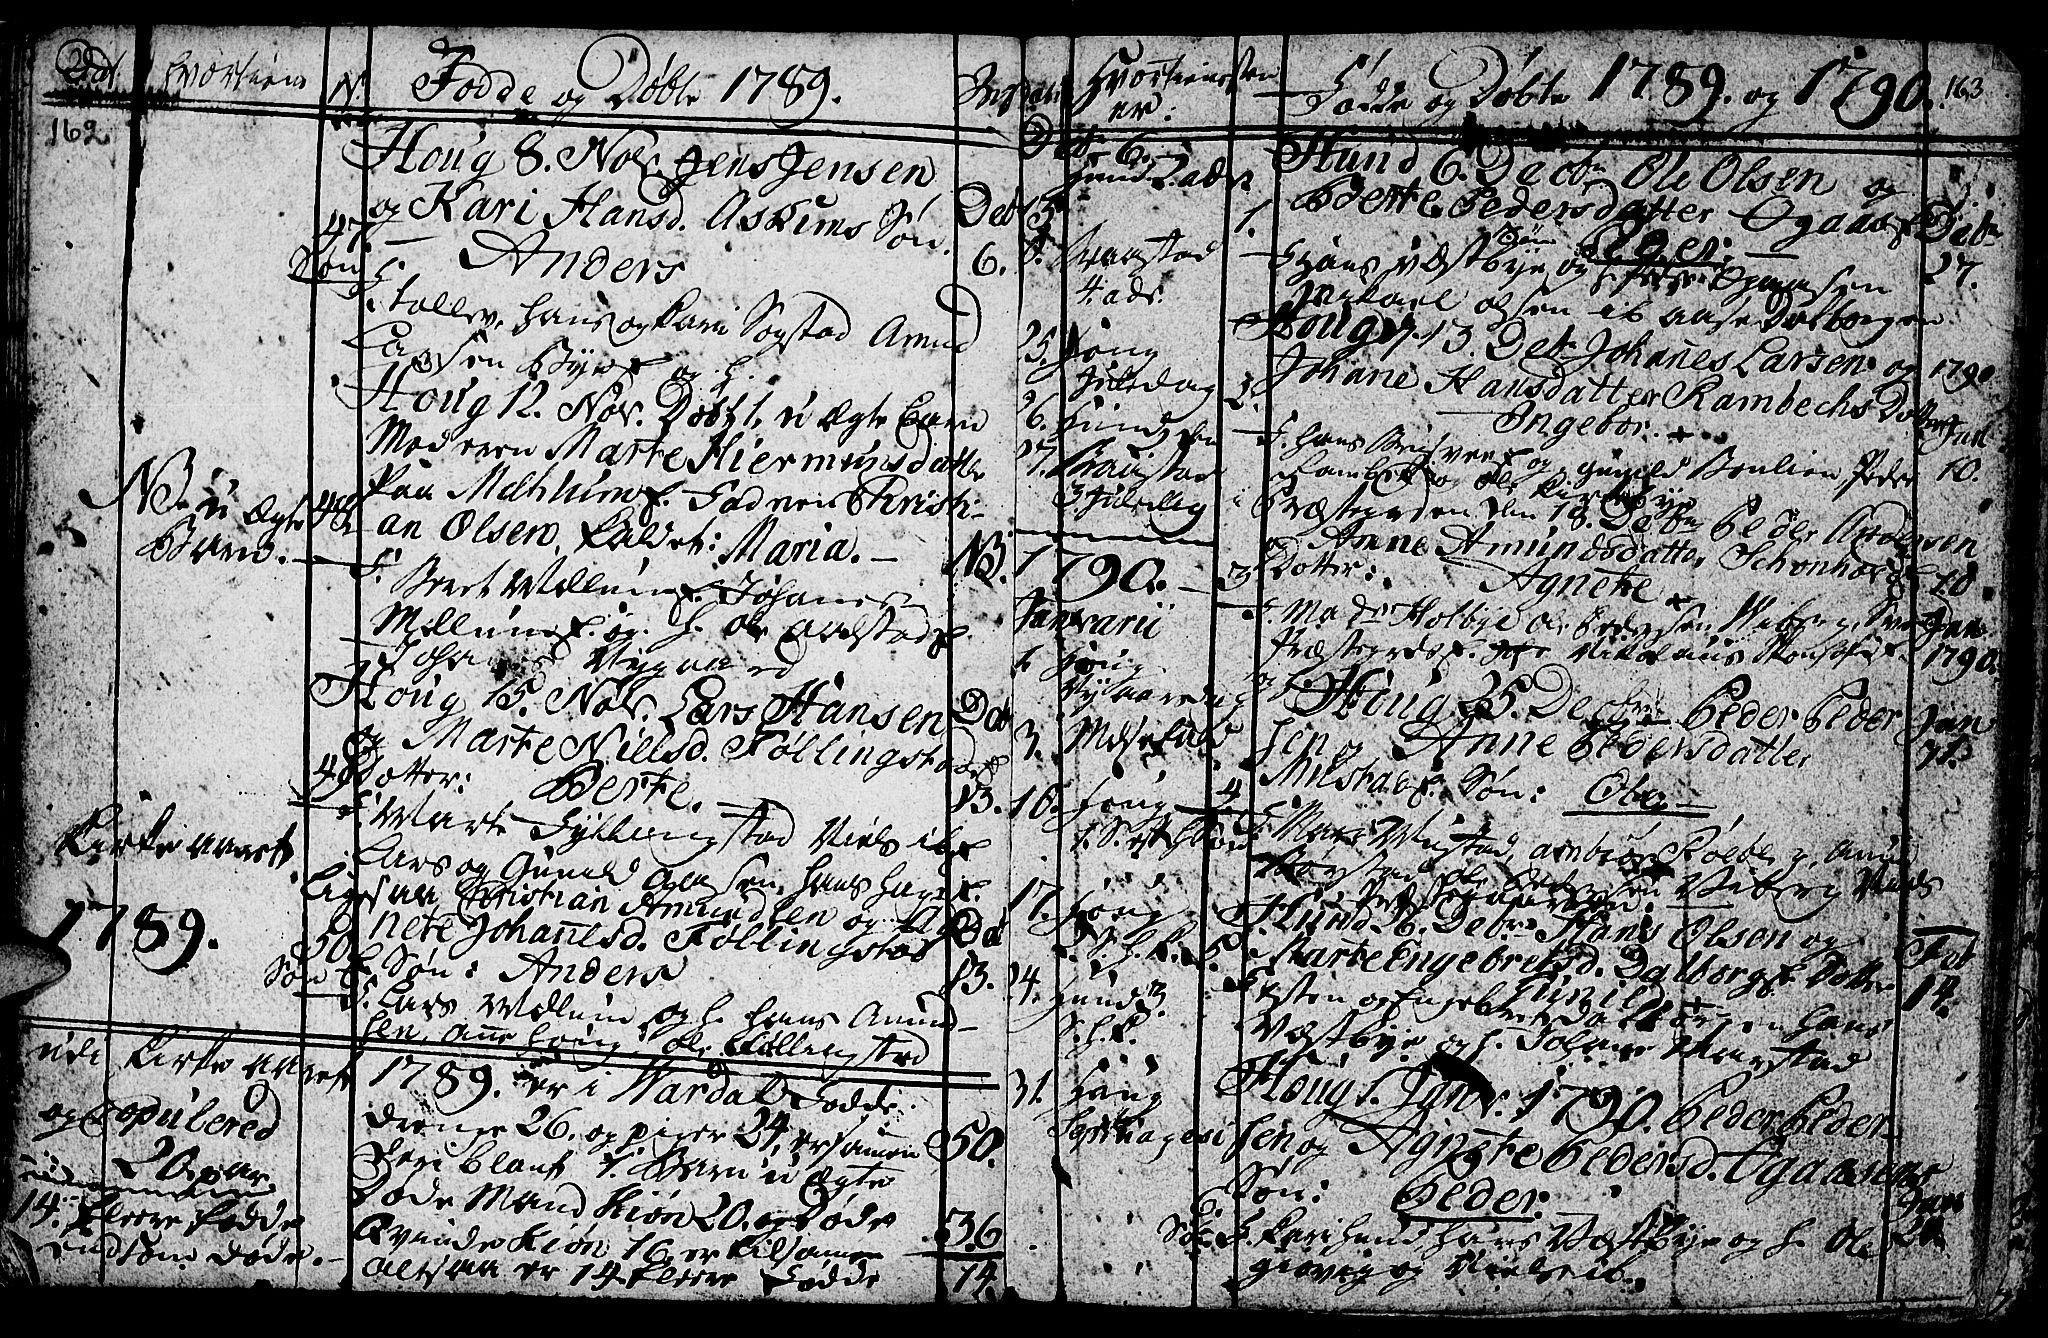 SAH, Vardal prestekontor, H/Ha/Hab/L0001: Klokkerbok nr. 1, 1771-1790, s. 162-163